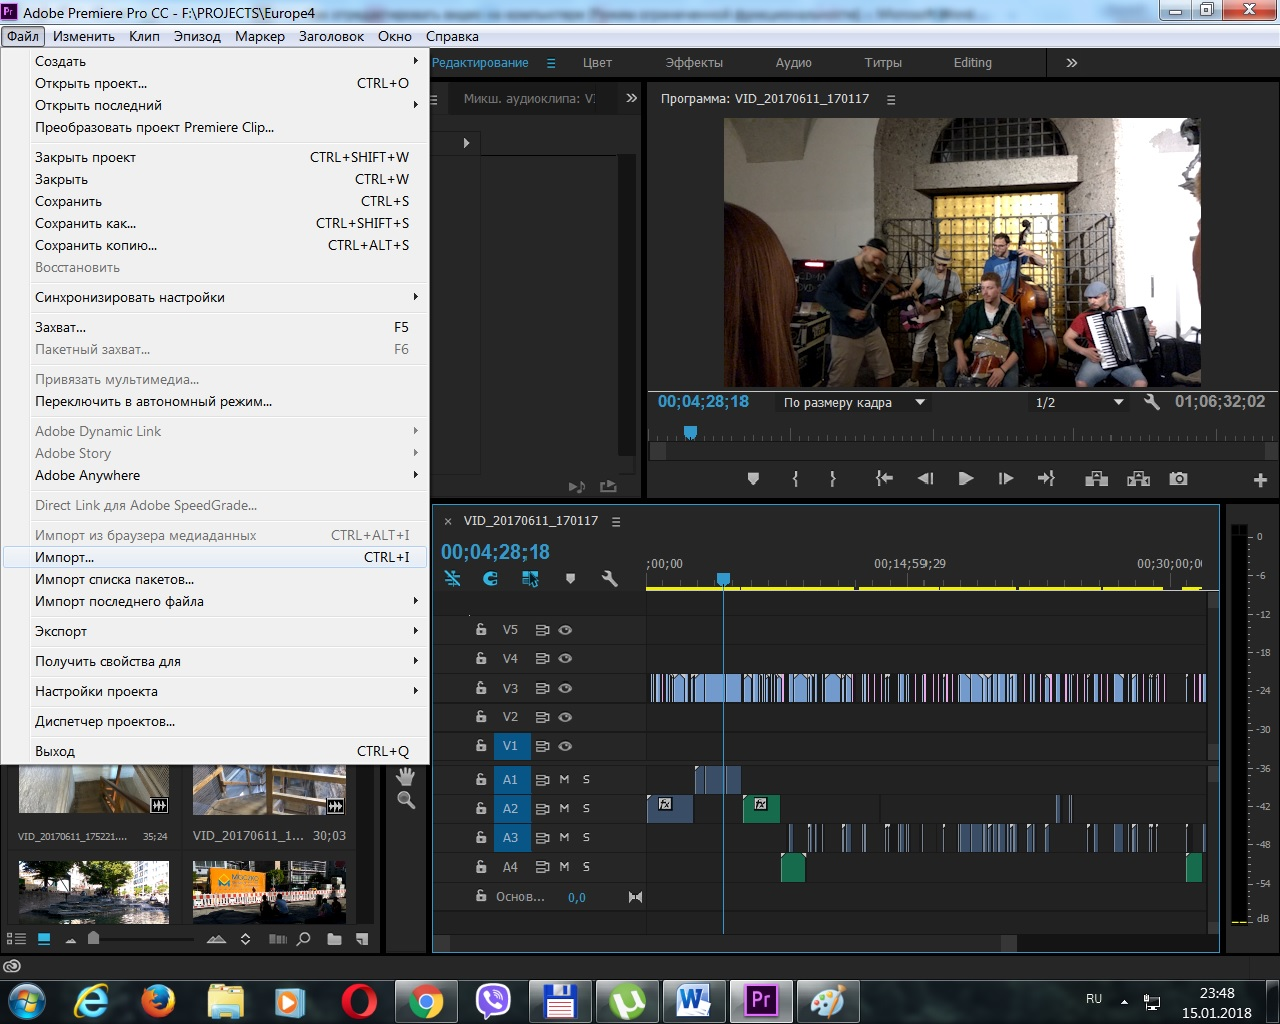 Создание нового проекта в программе Adobe Premiere